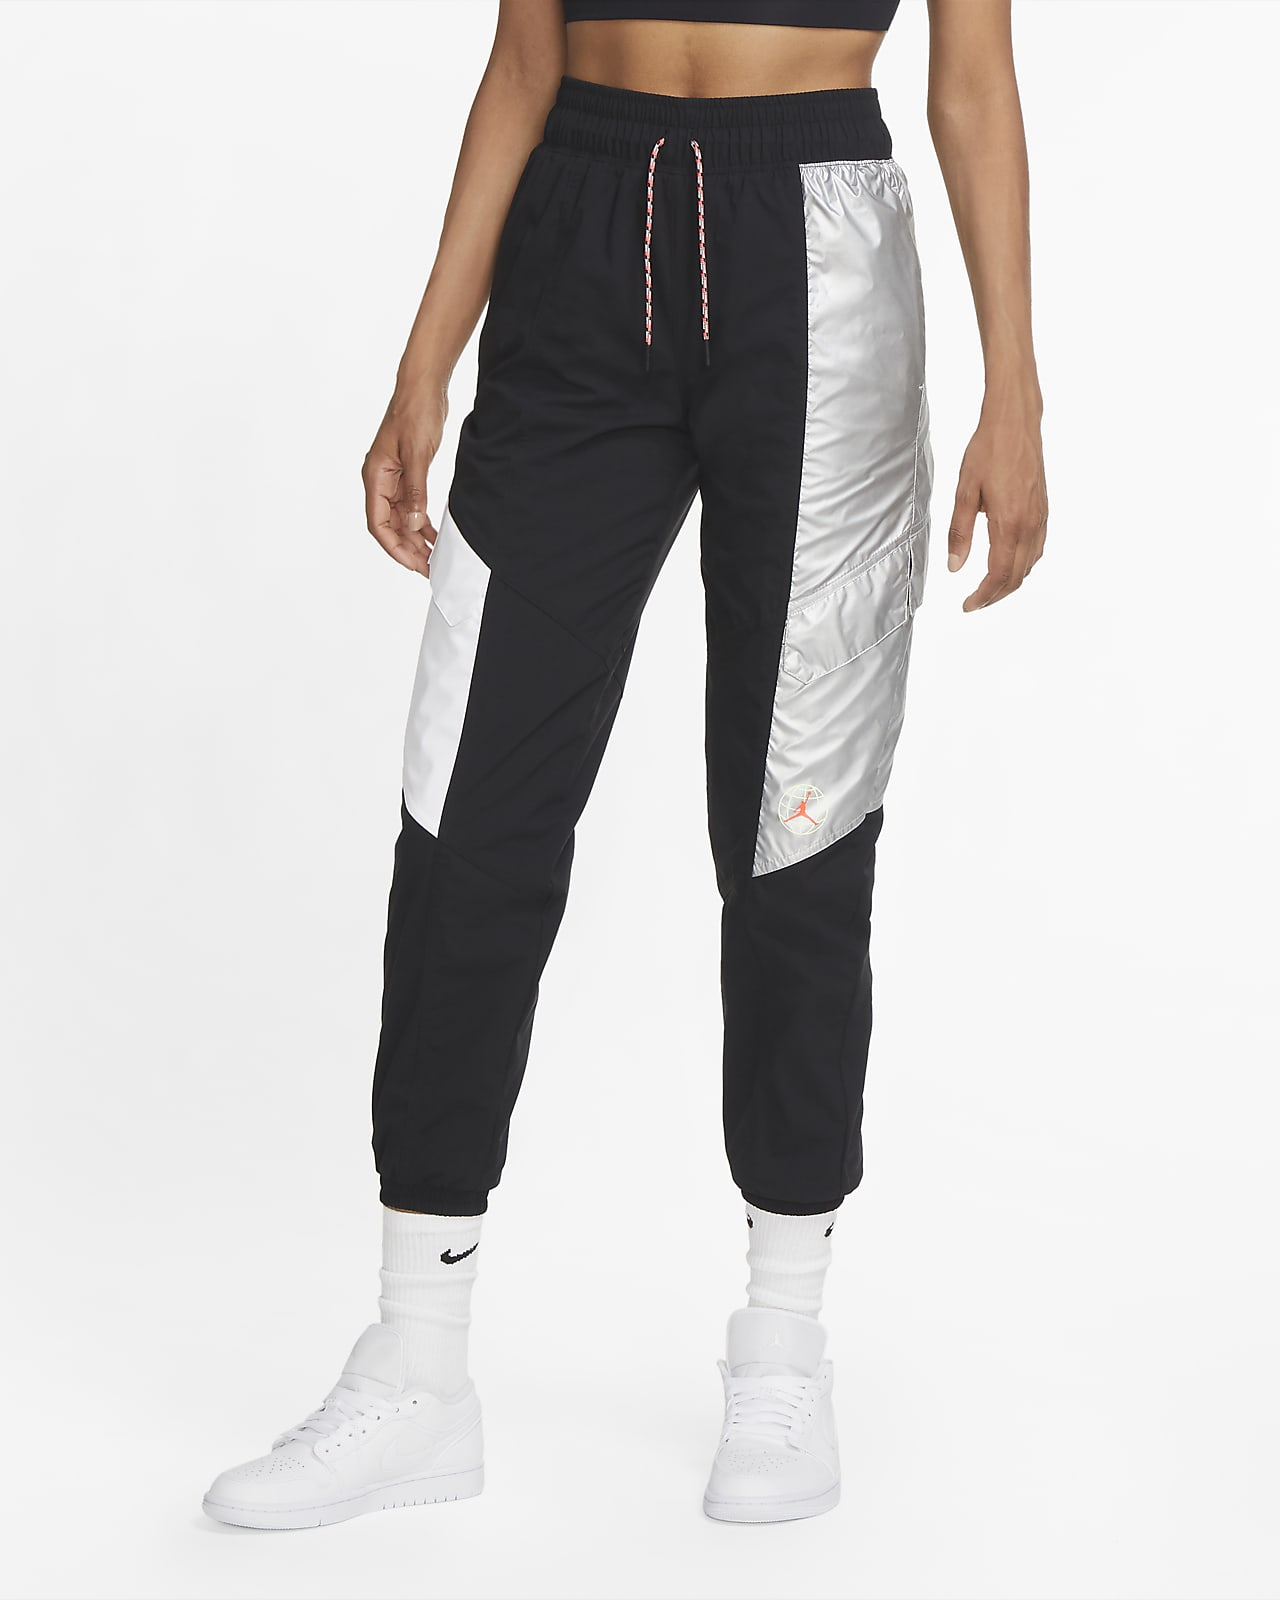 Pantaloni Jordan Winter Utility - Donna